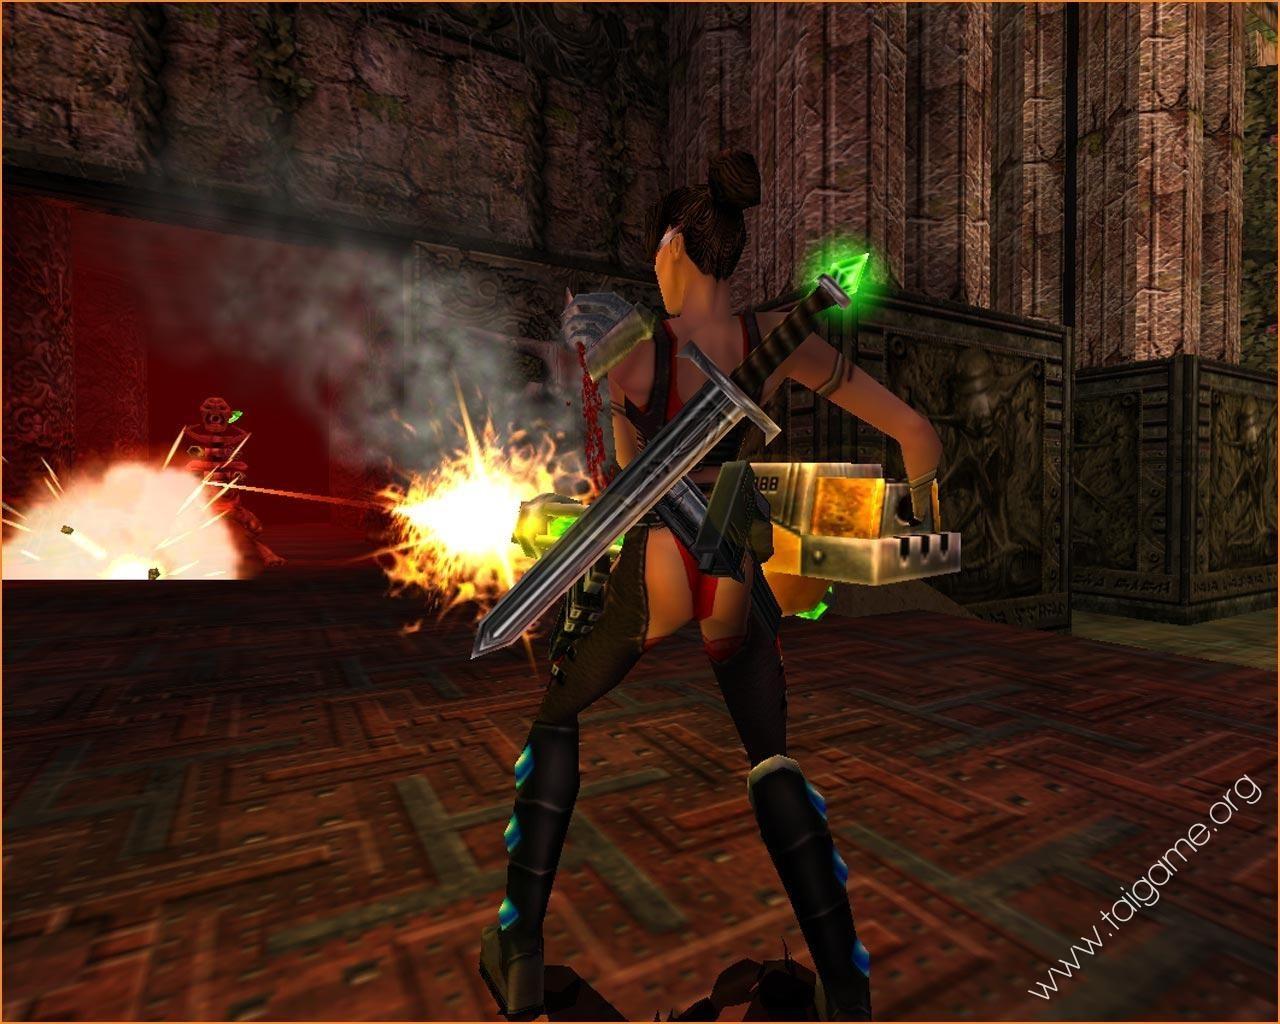 Heavy Metal Game